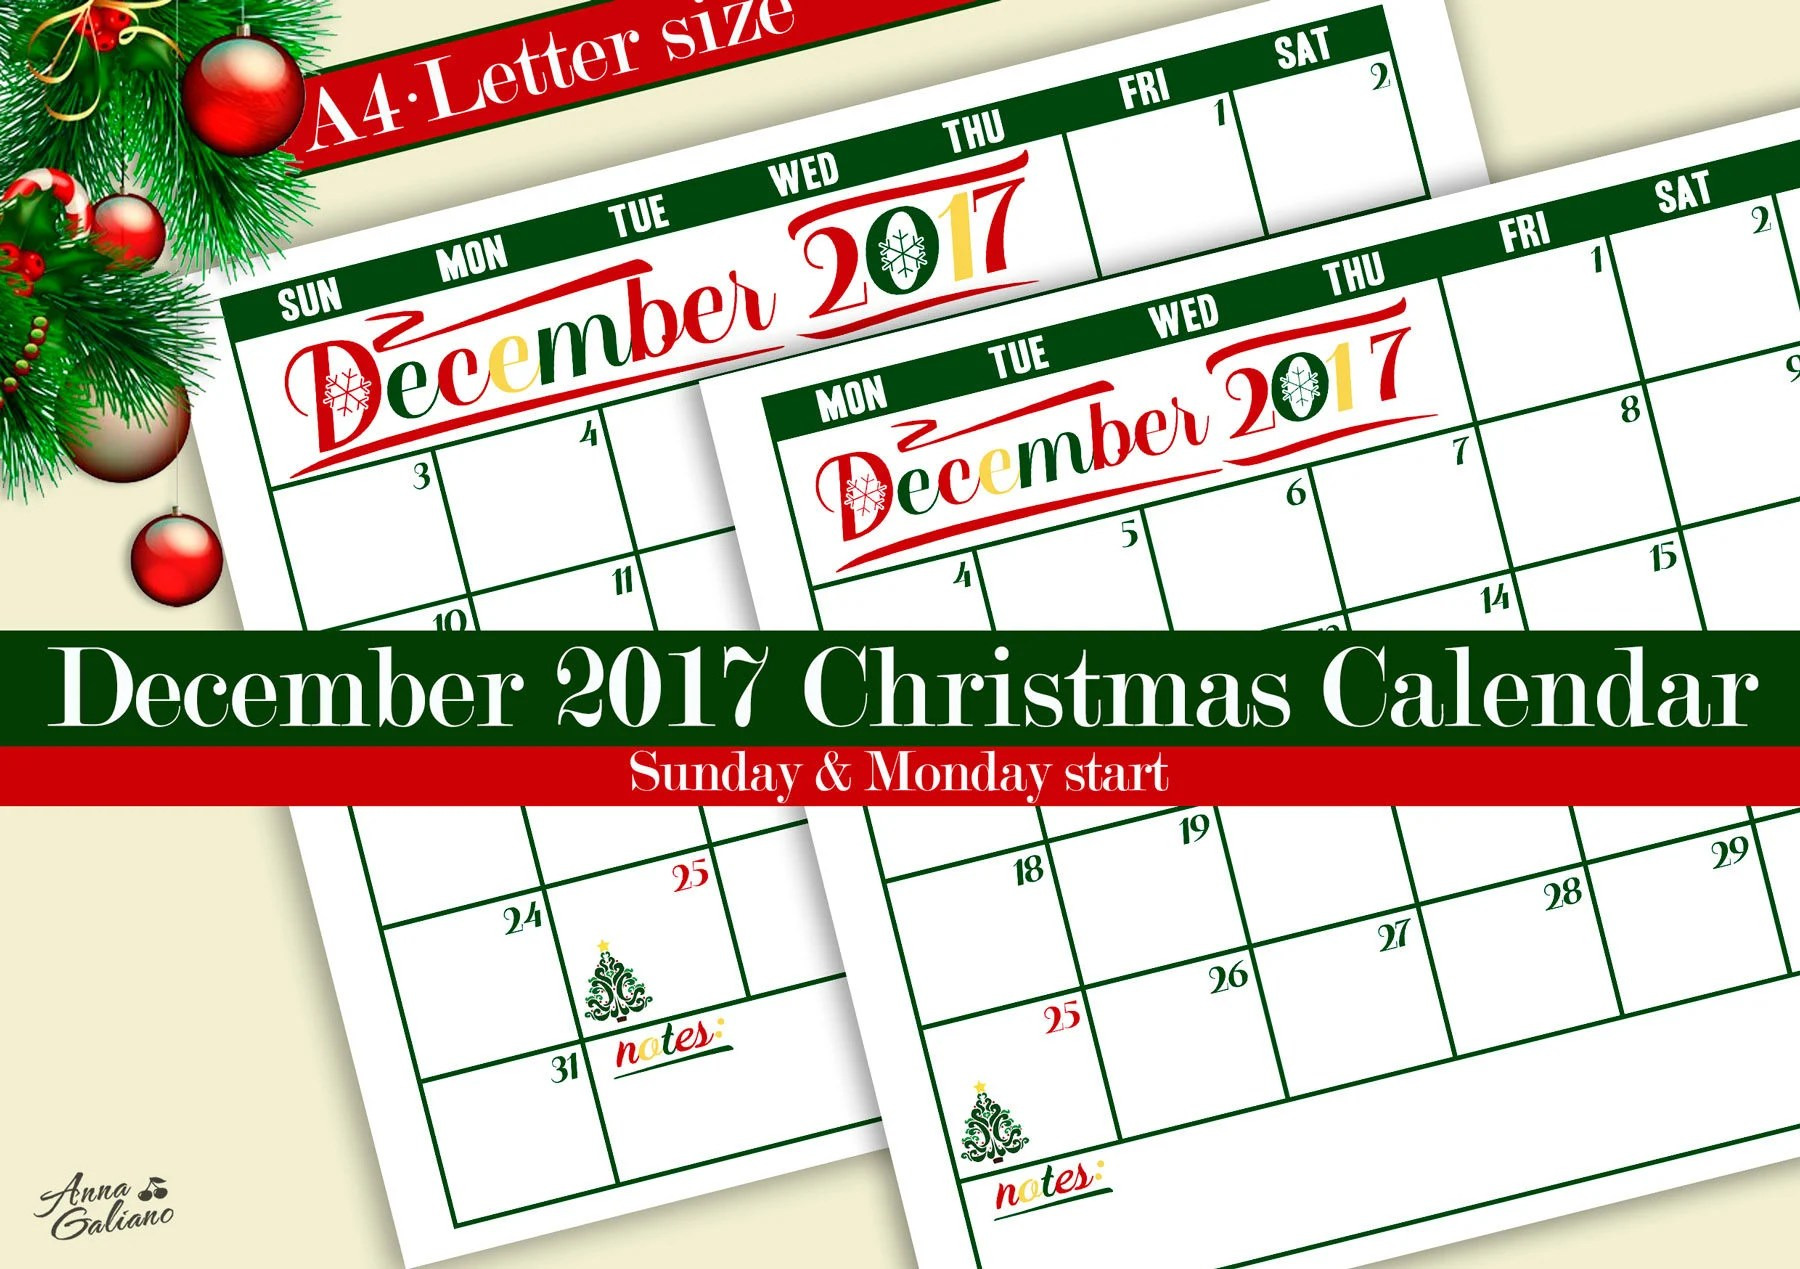 Month Calendar Number Calendar Java Platform Se 7 Oracle Help Center December 2017 Christmas Calendar Christmas Printable